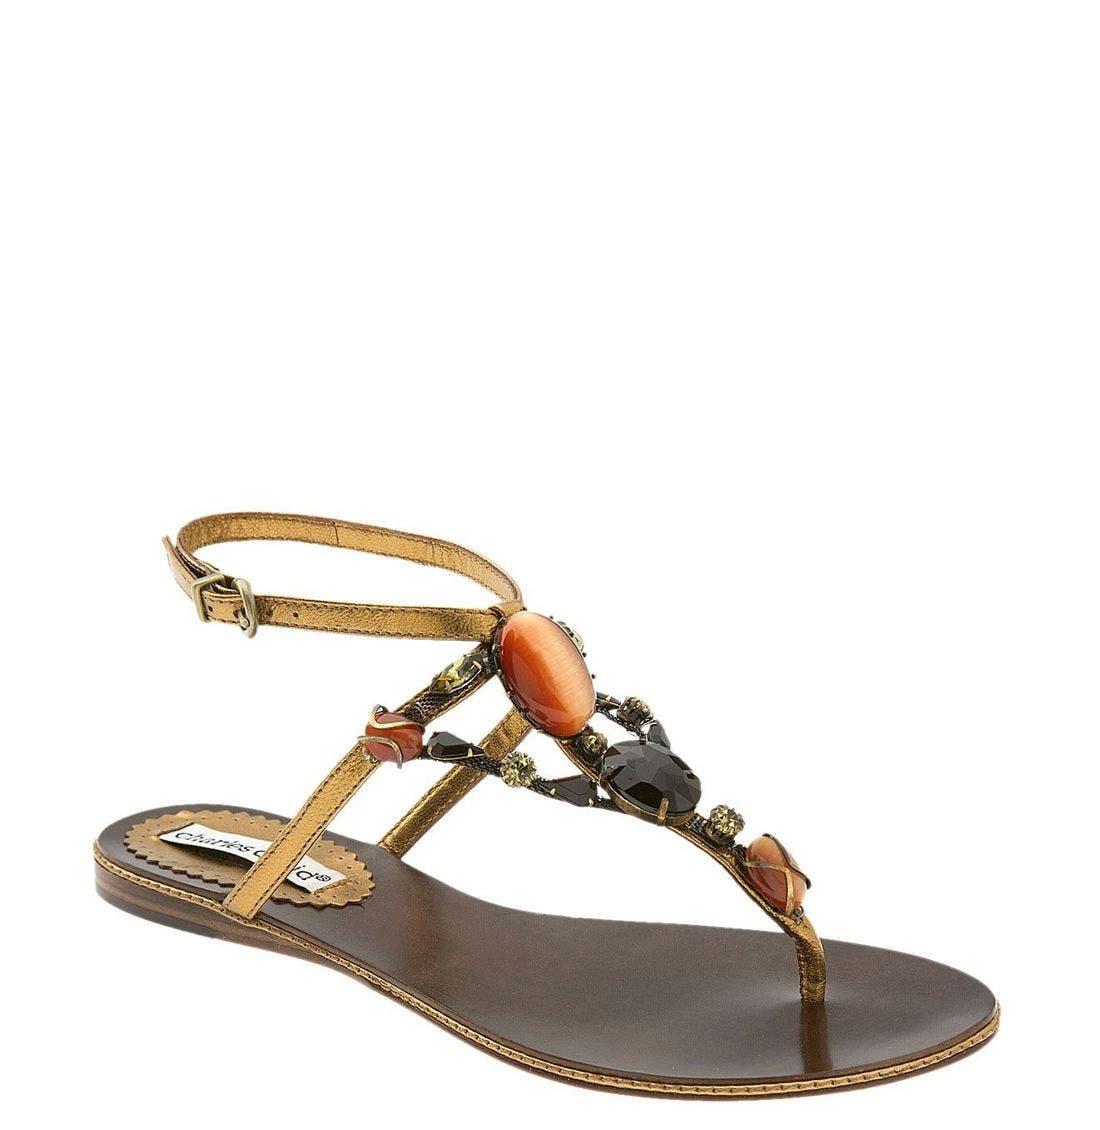 Main Image - Charles David 'Starlite' Thong Sandal